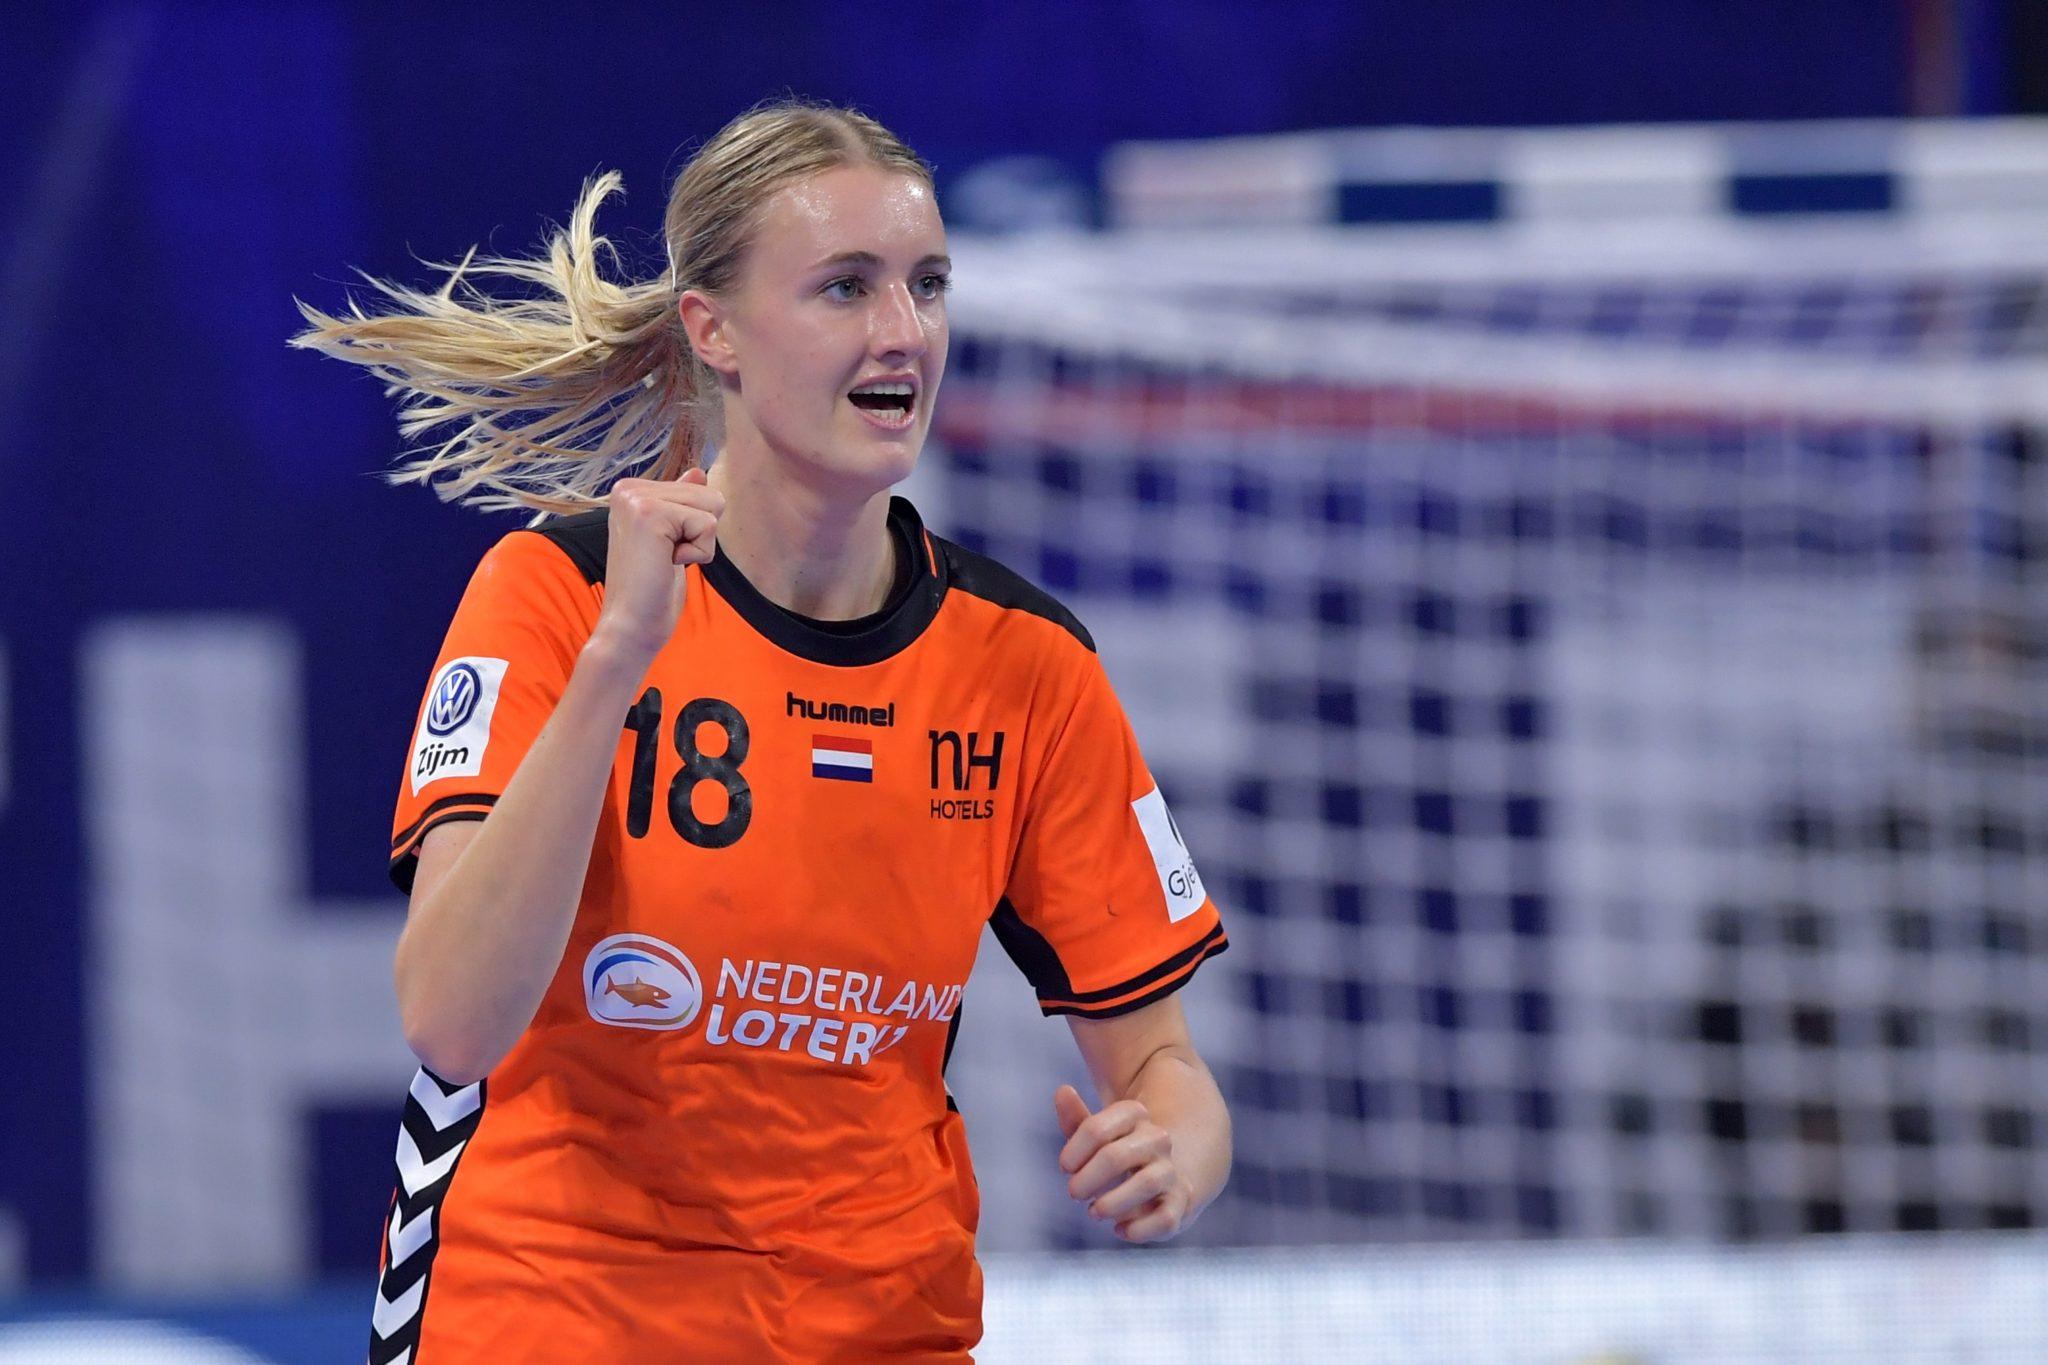 12-12-2018: Handbal: Vrouwen Nederland V Duitsland: Nancy EK Handbal In Frankrijk, Hoofdronde Groep II Nederland - Duitsland Kelly Dulfer #18 NED